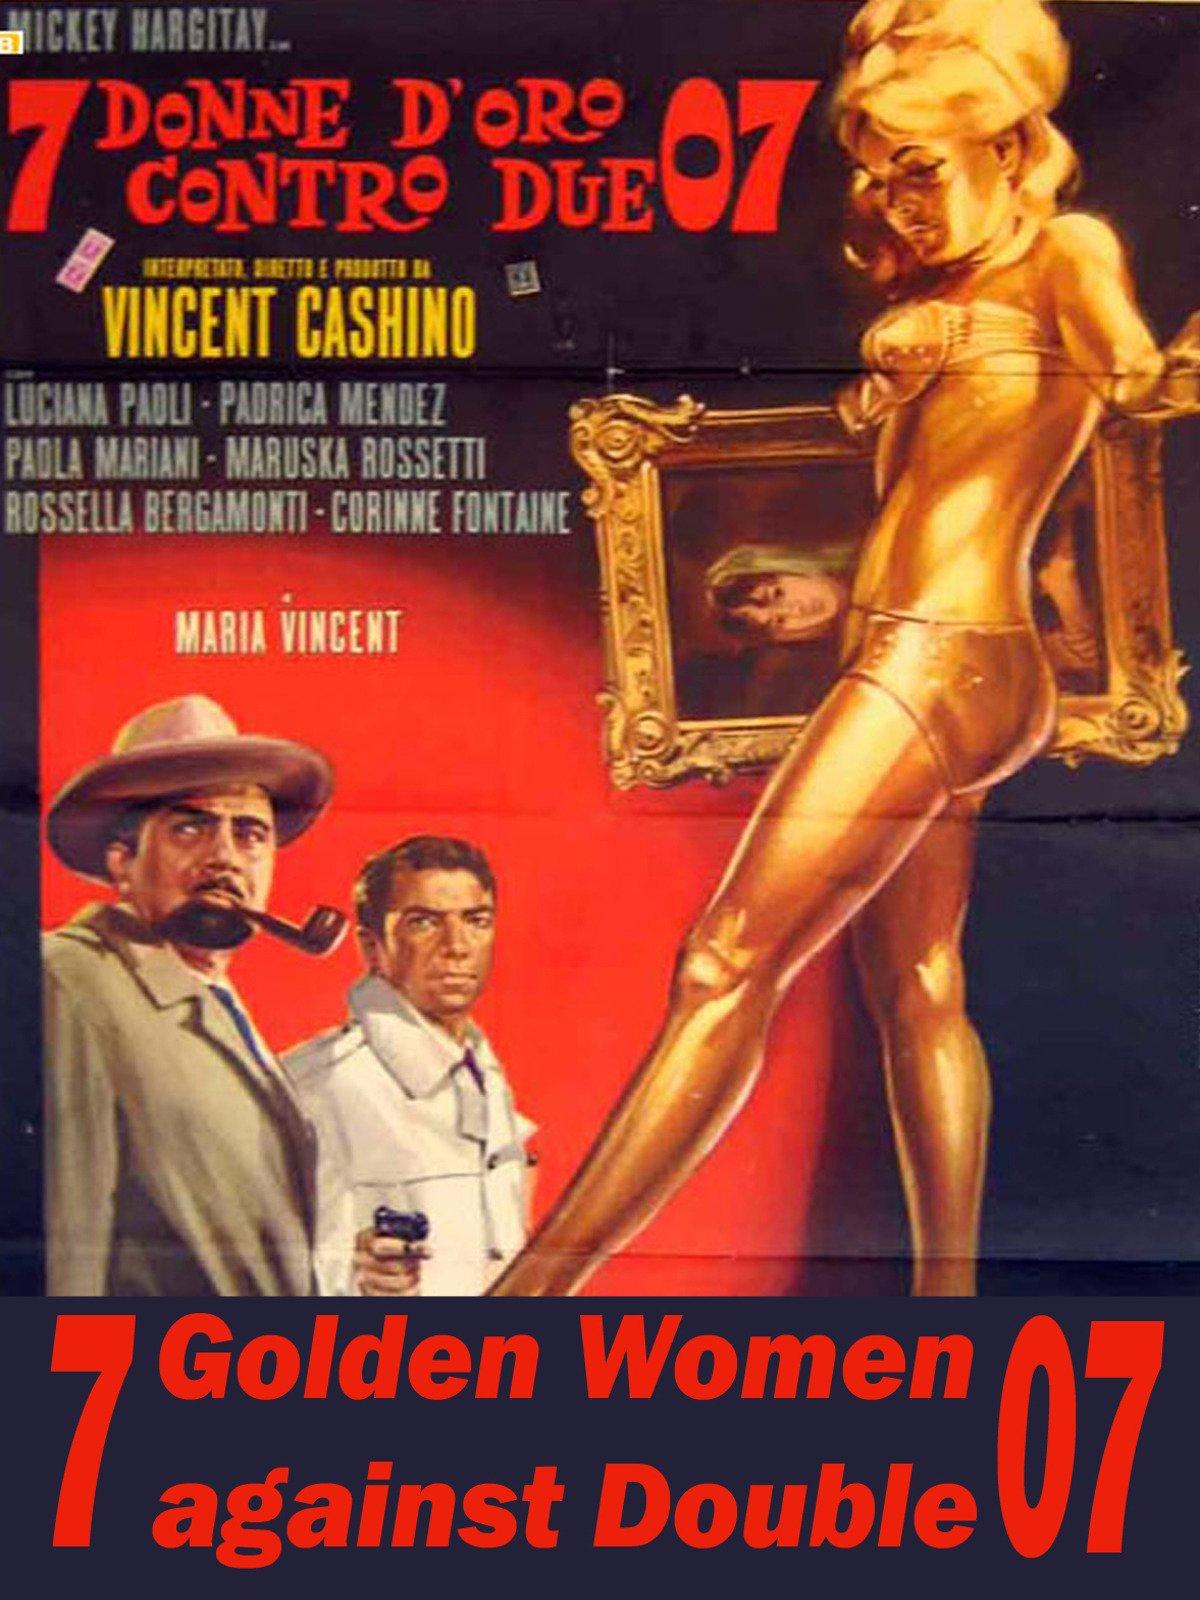 7 Golden Women Against Double O7